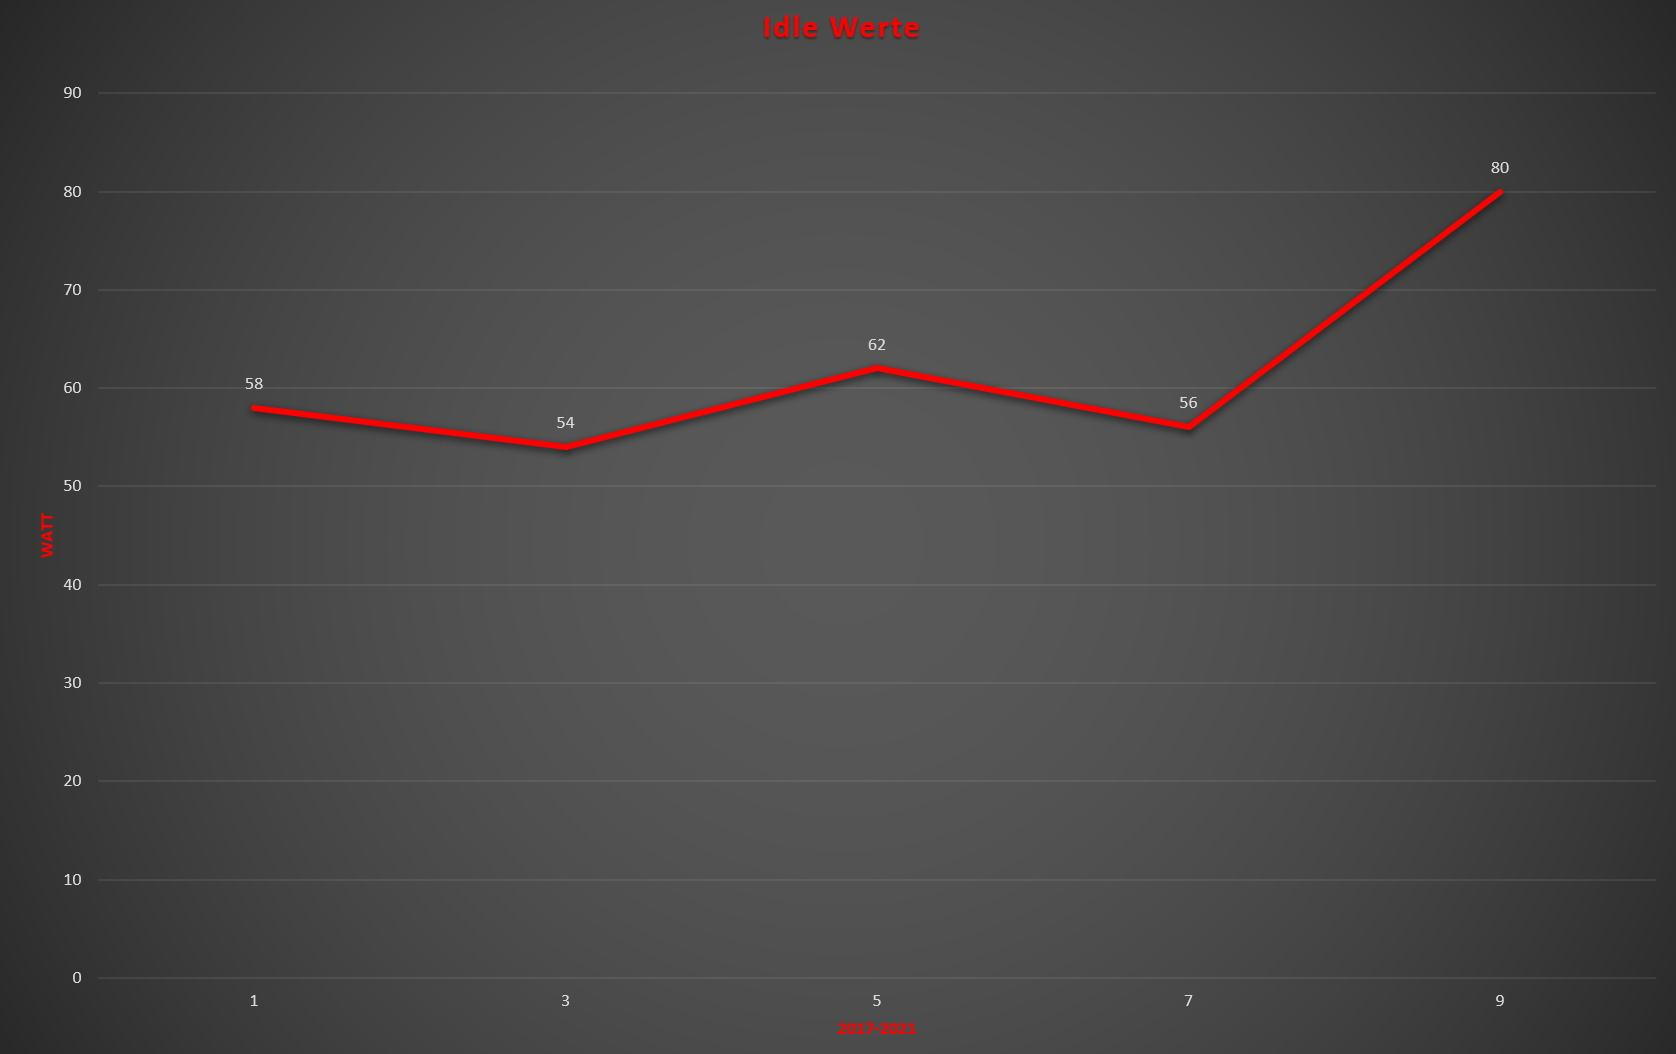 Idle Werte 2021-2017.jpg